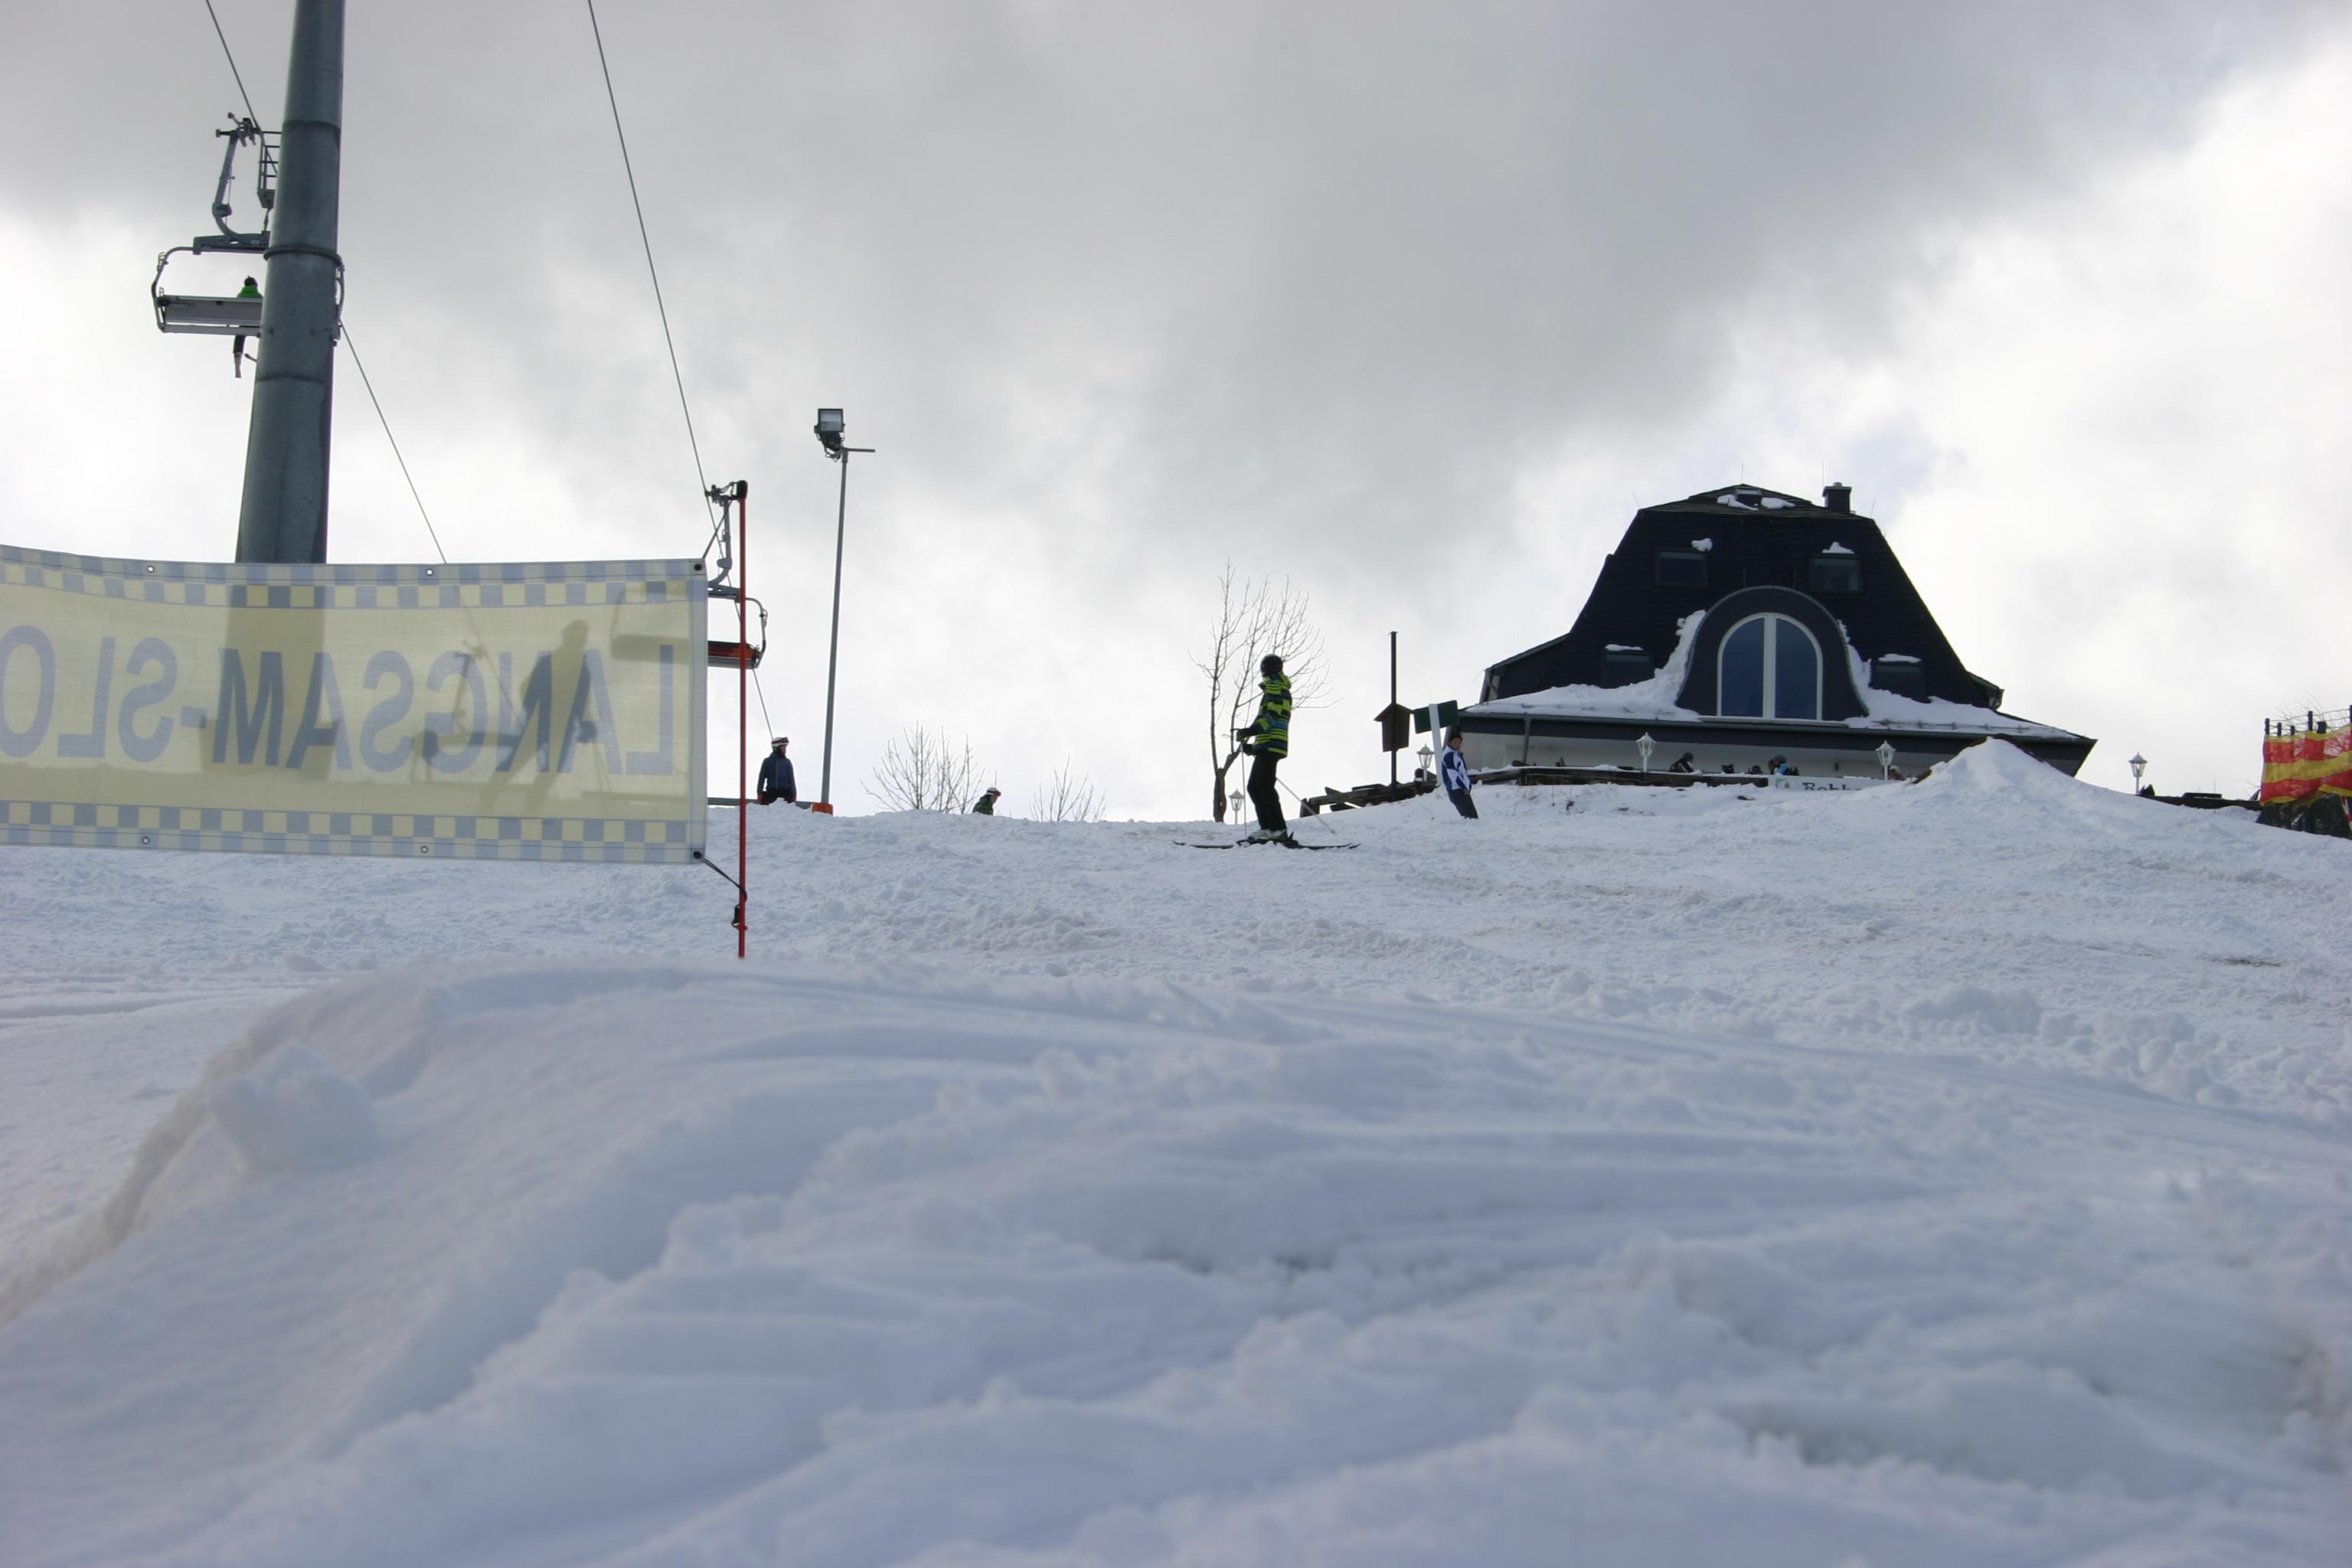 Wintersport Arena Sauerland 207 - Winterberg